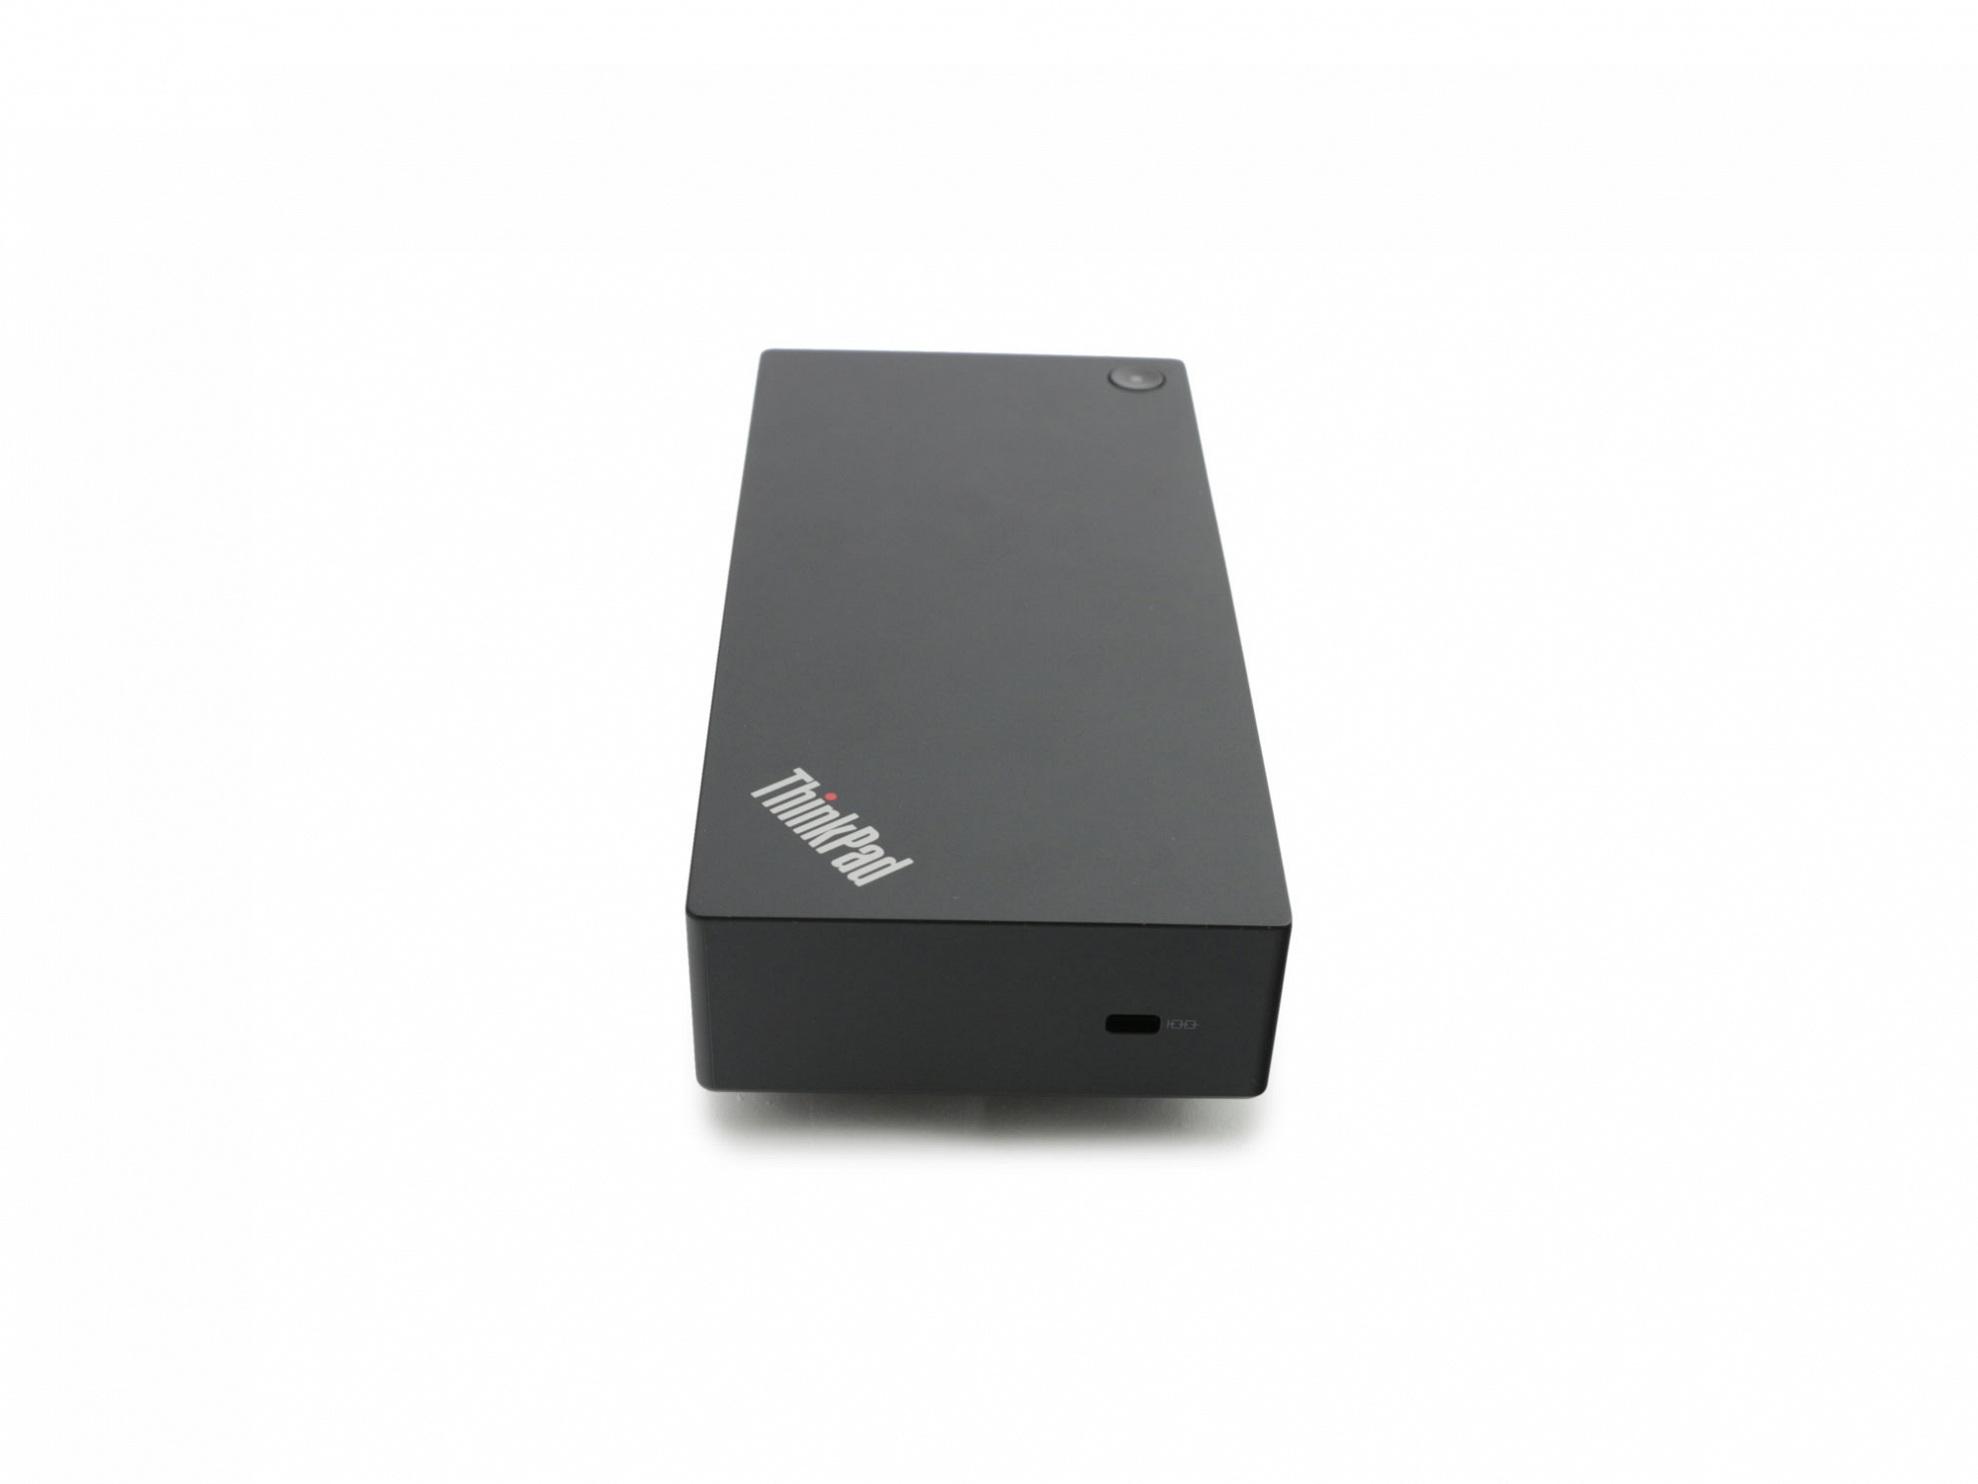 Port Replikator ThinkPad USB-C Dock (Bulk) für Asus ZenFone 4 ...